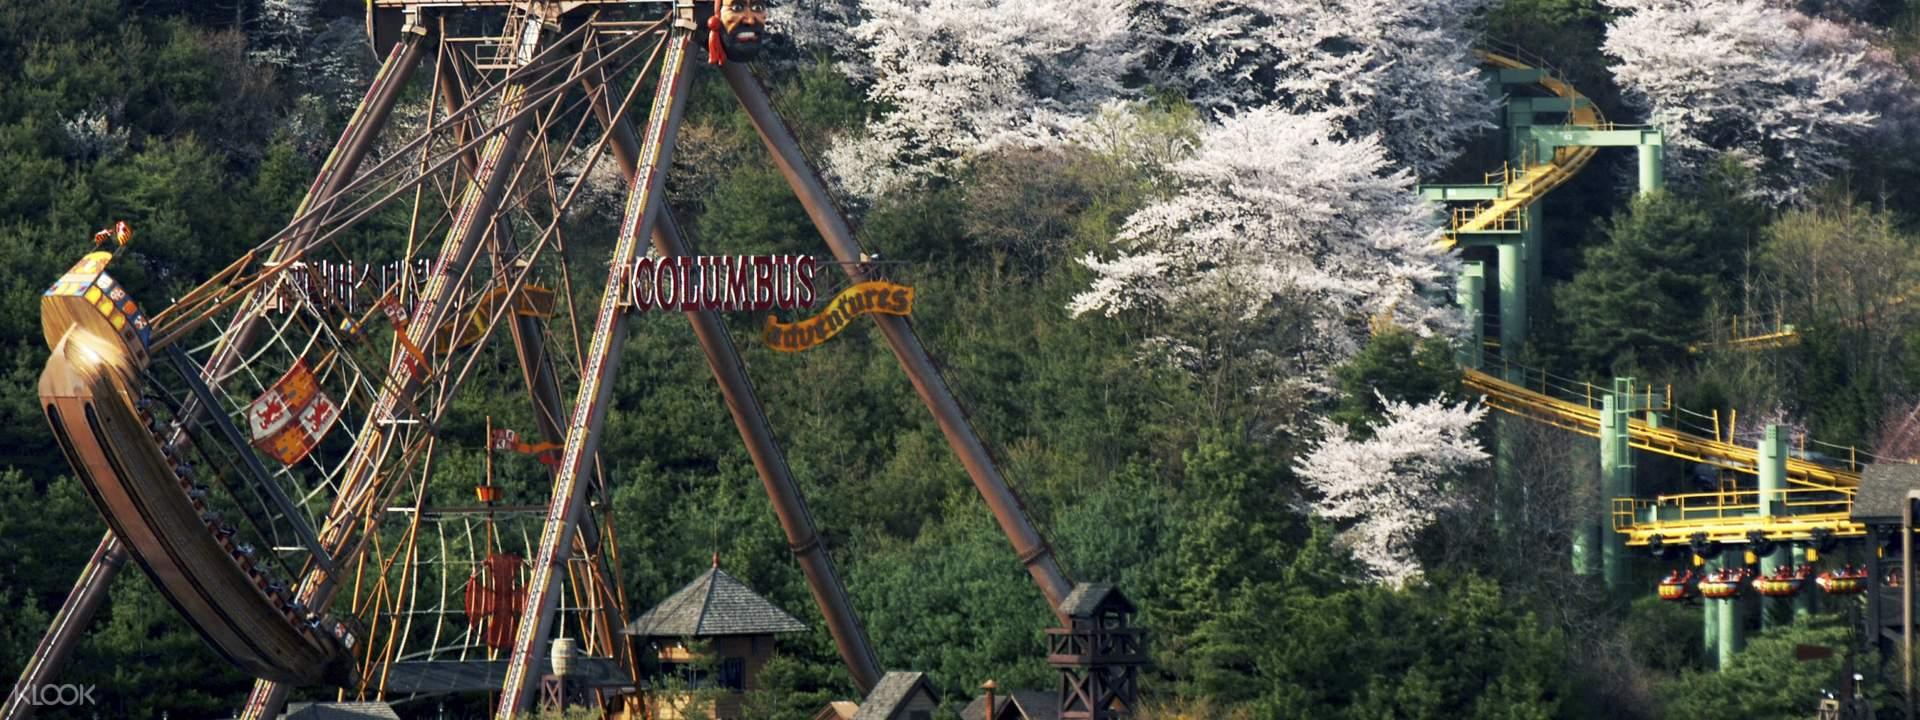 Everland Korea Theme Park Tickets - One Day Pass (QR Code